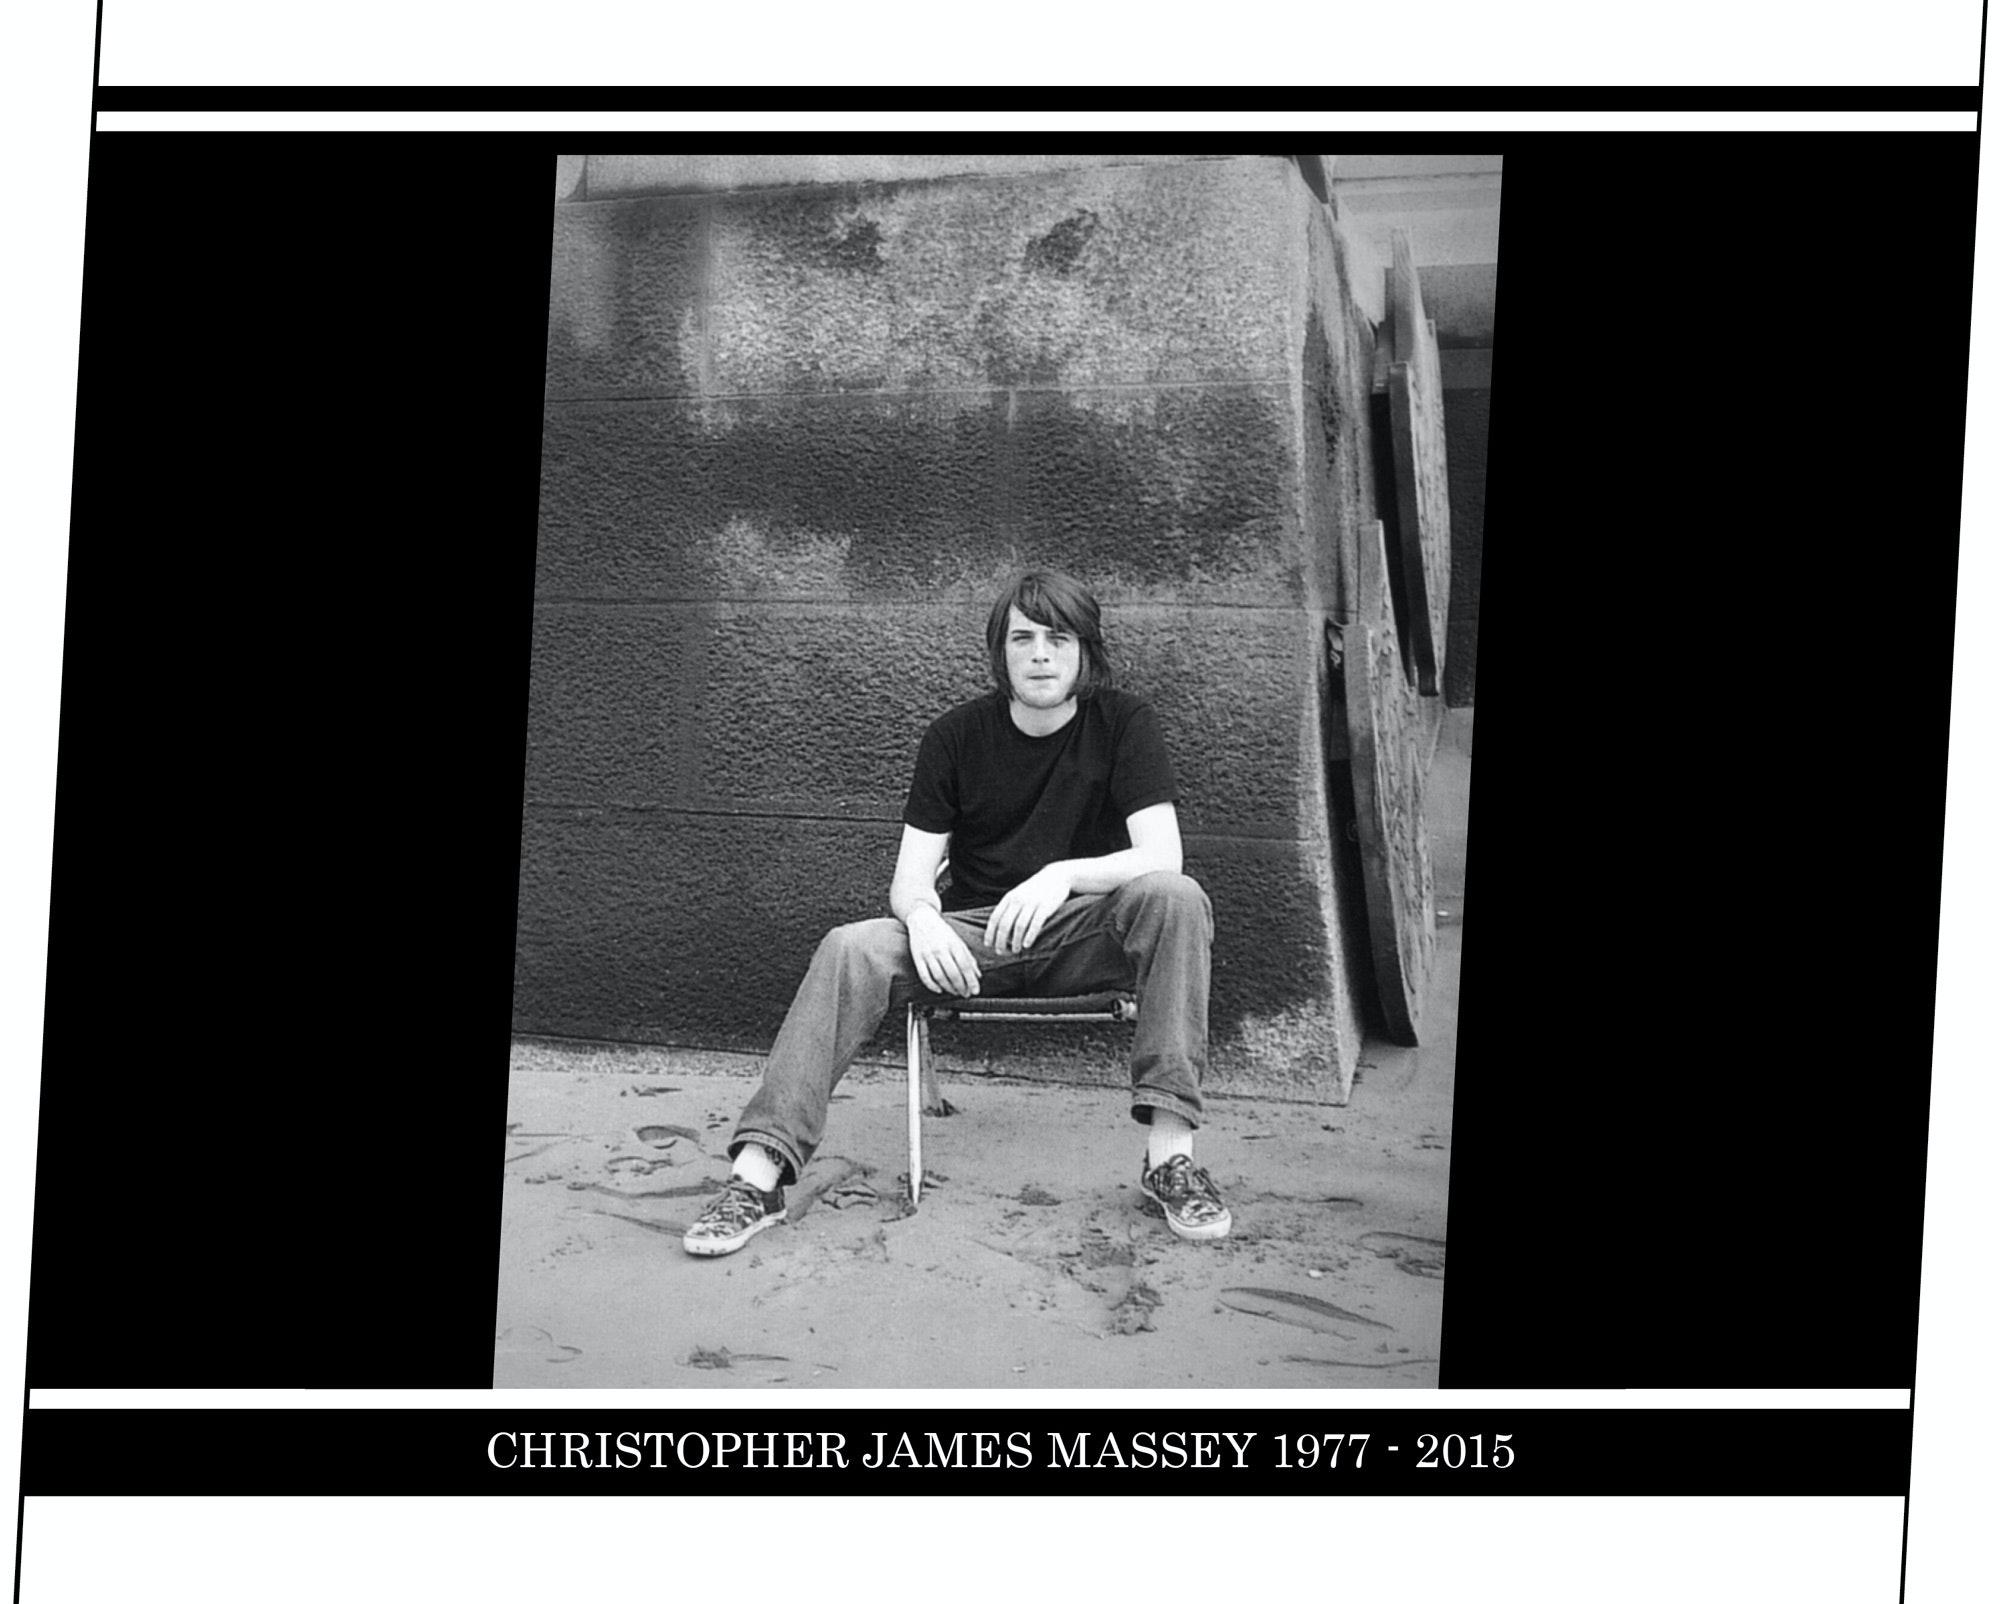 Christopher James Massey